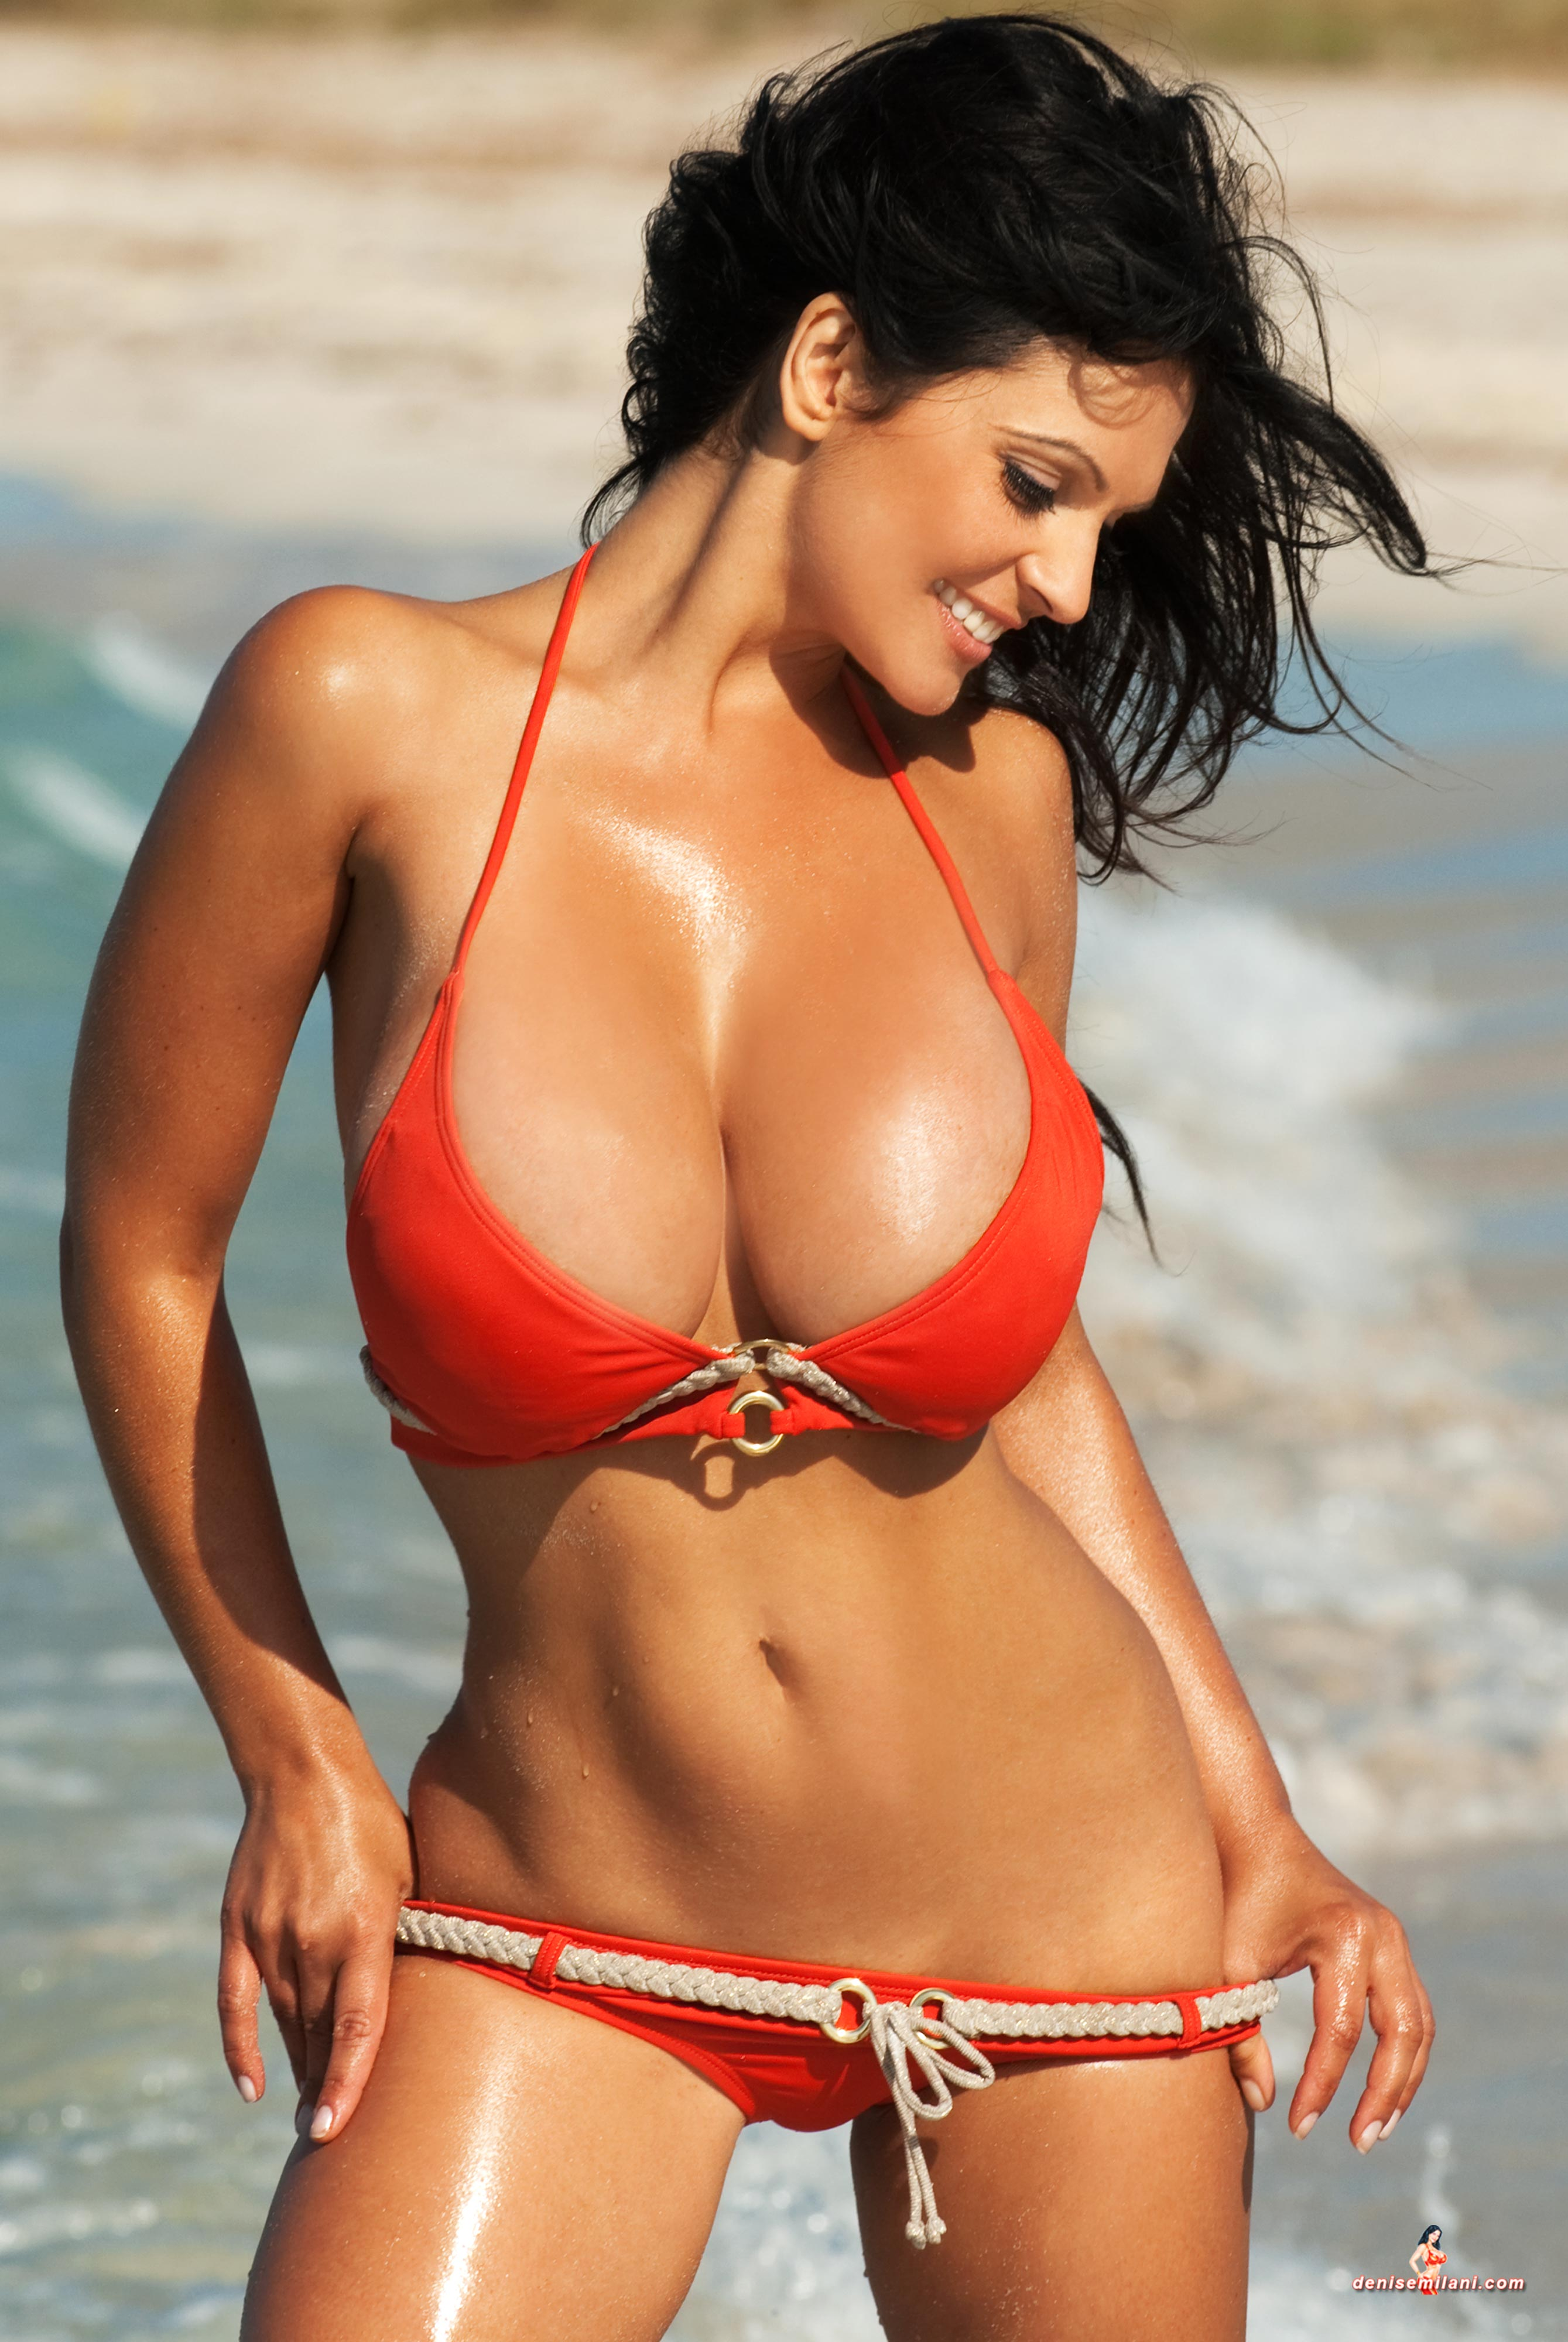 Bikini babes hot bikini girls dream big black diamonds breast boobs sexy gorgeous women